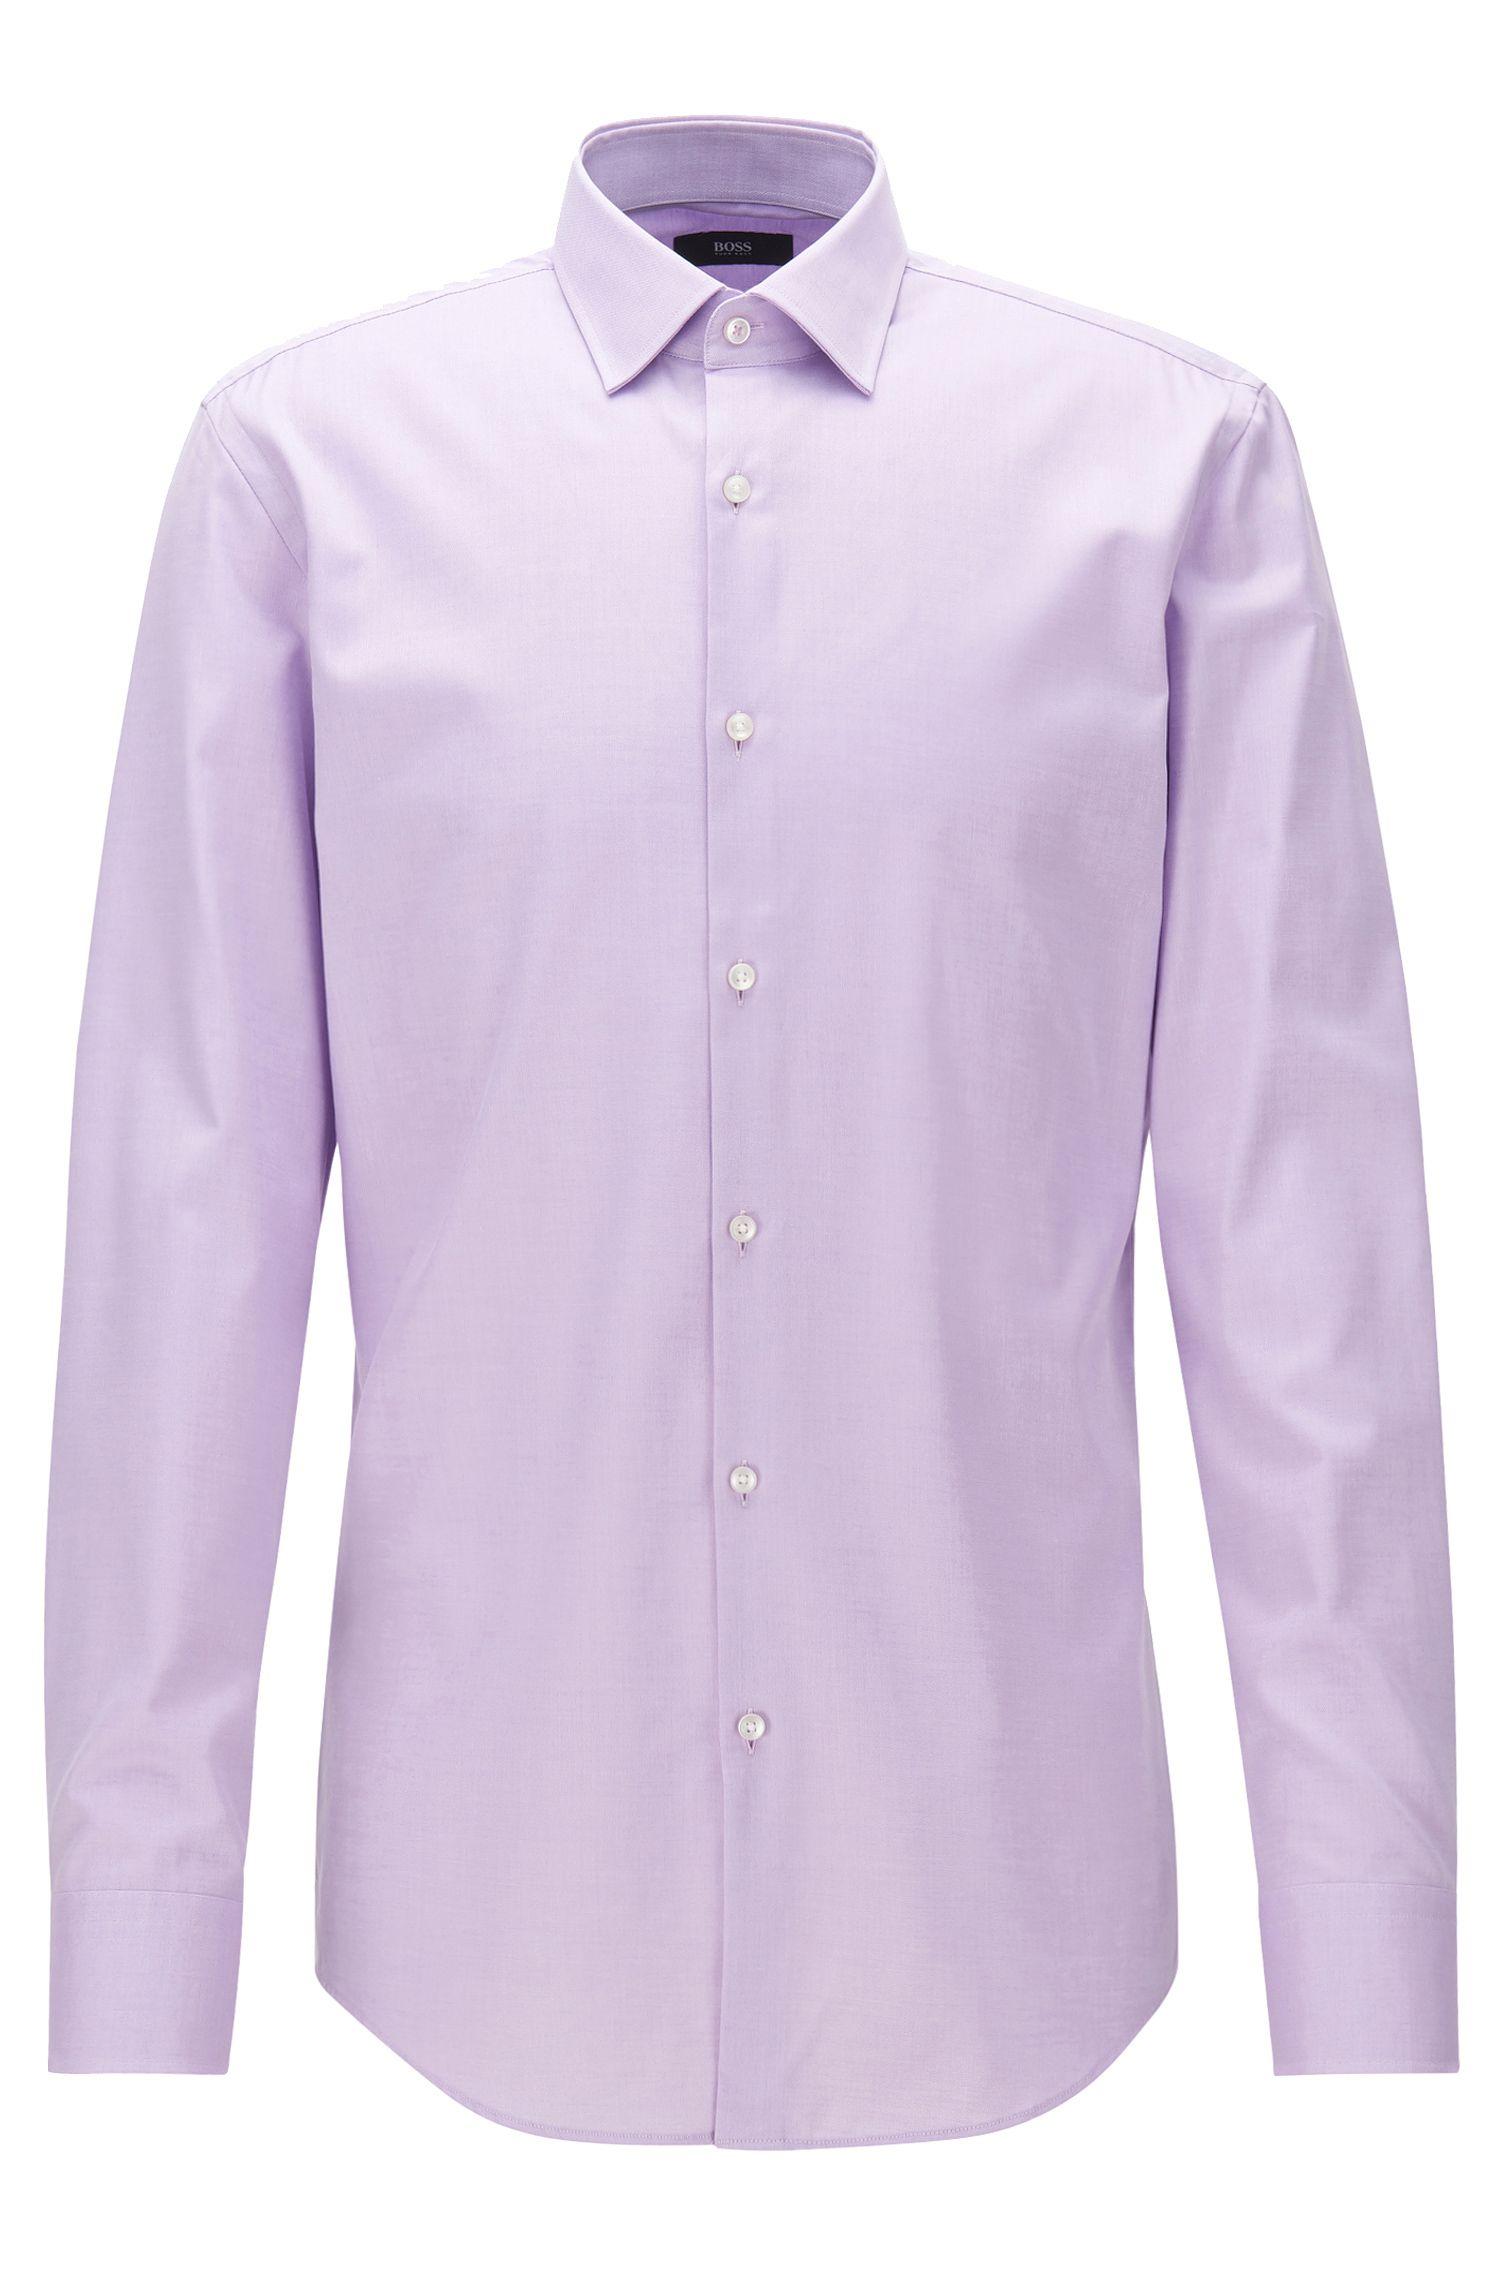 Cotton Dress Shirt, Slim Fit  | Jerris